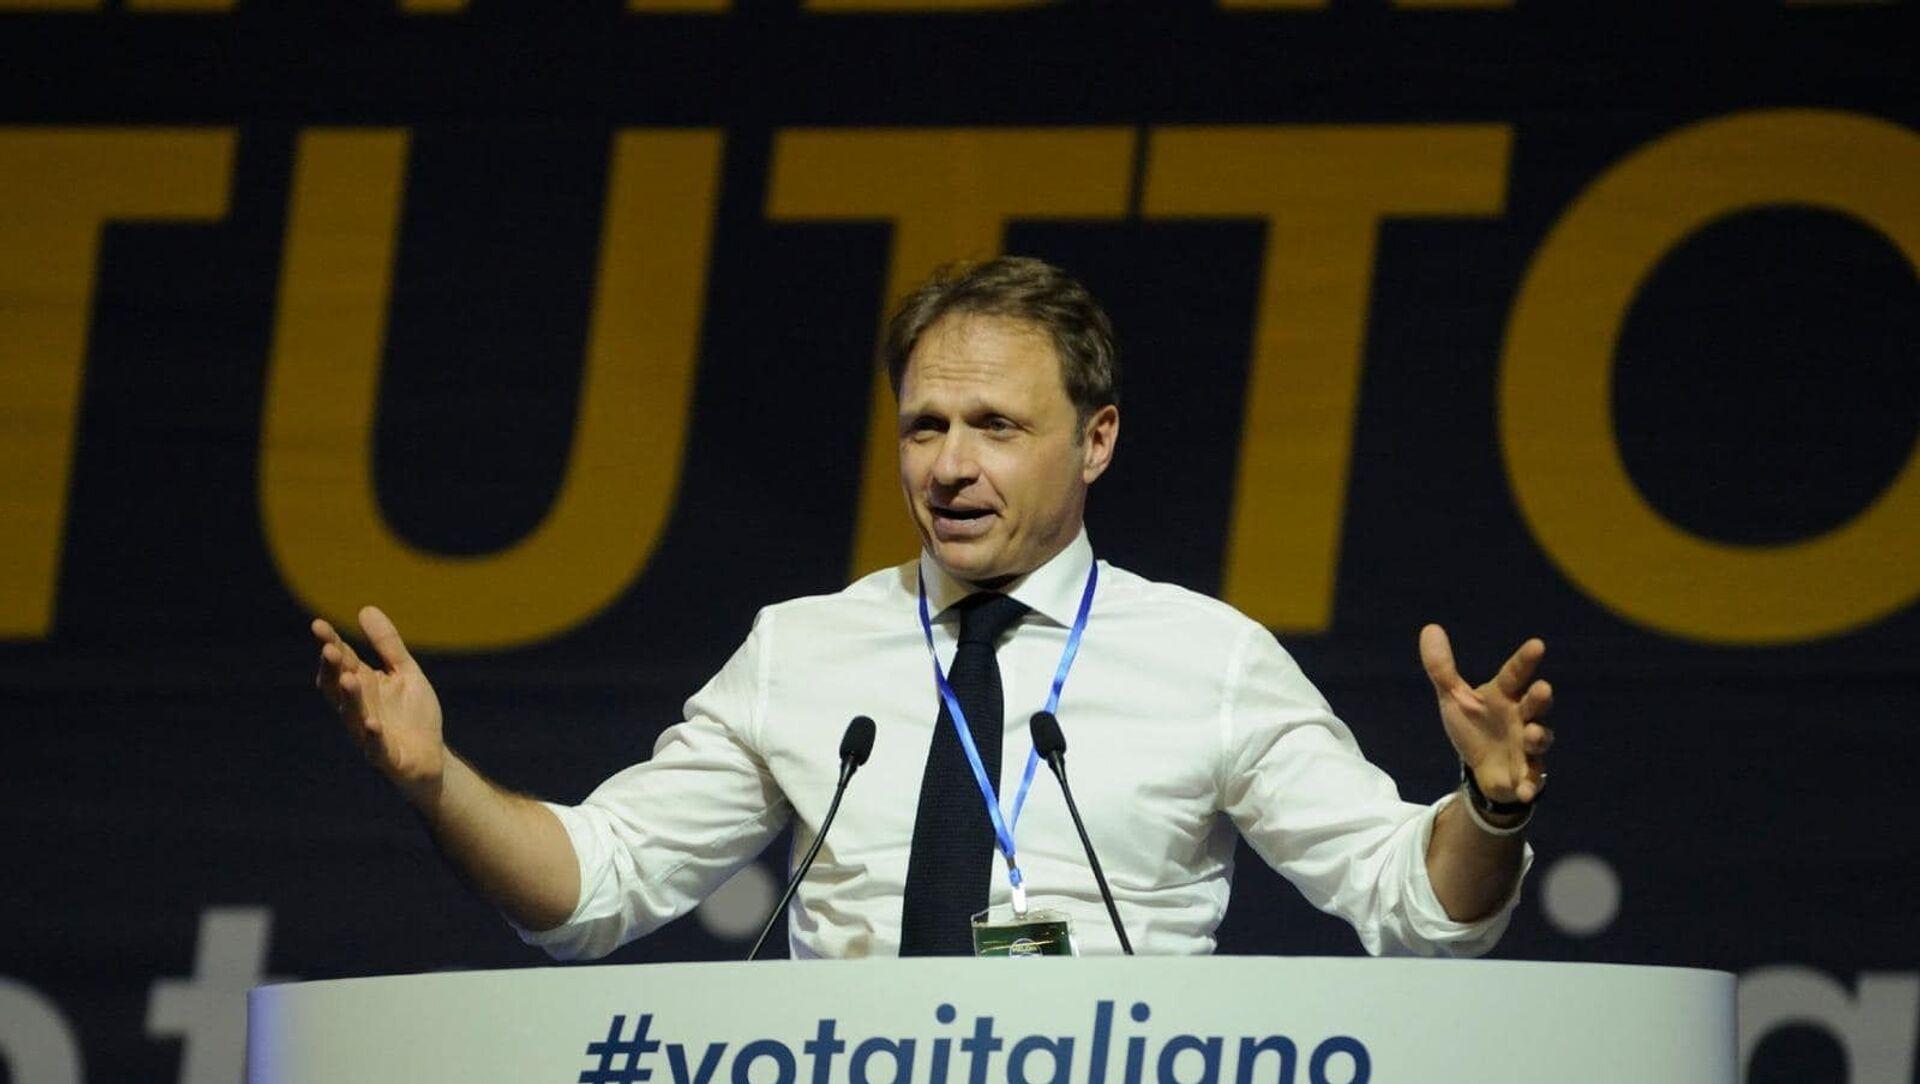 Francesco Lollobrigida, capogruppo di Fratelli d'Italia alla Camera. - Sputnik Italia, 1920, 07.05.2021